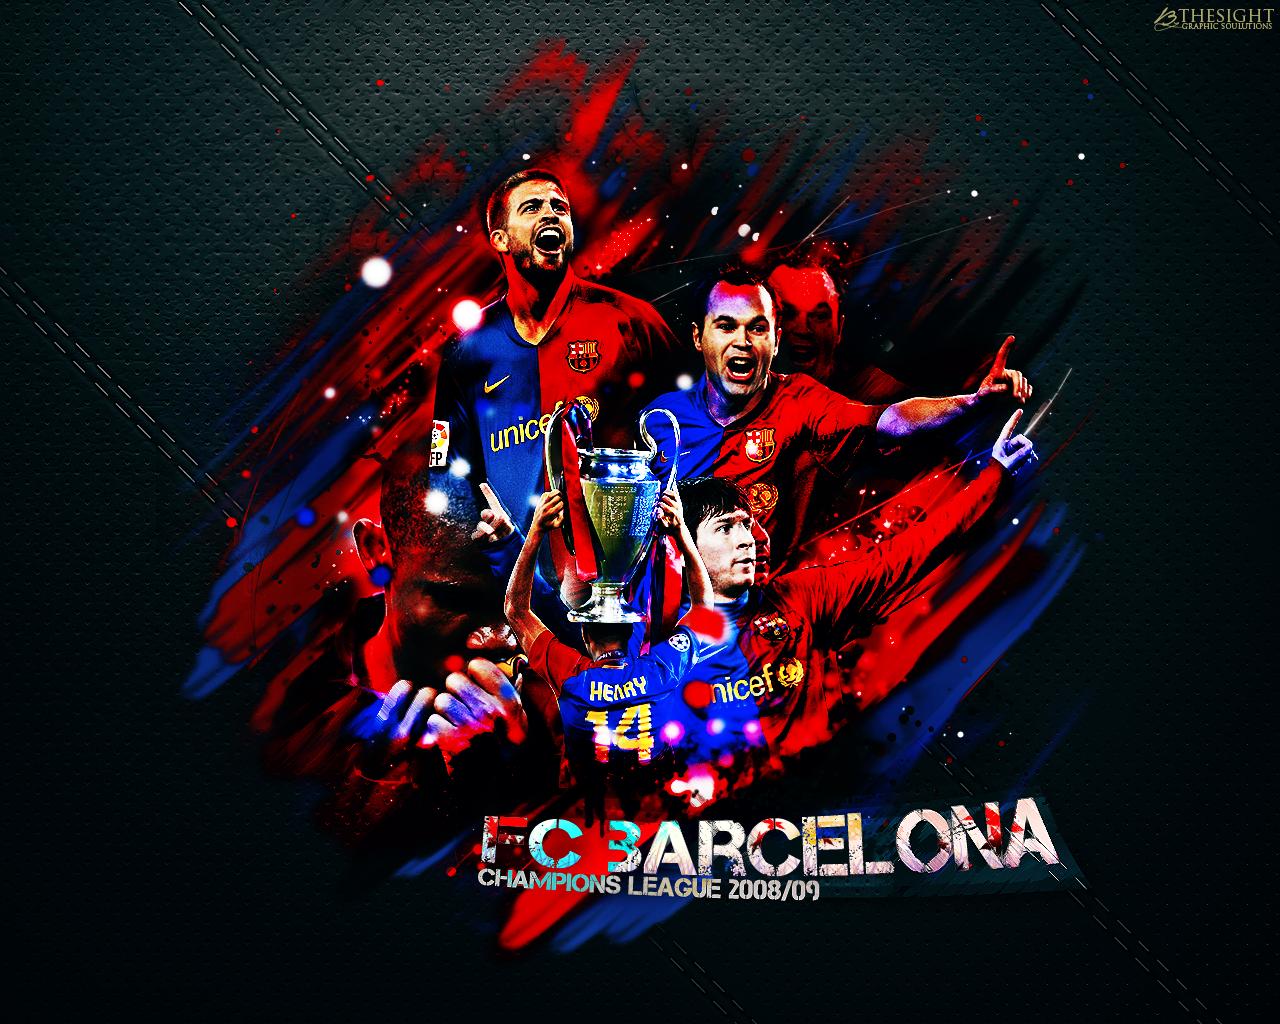 http://3.bp.blogspot.com/-OB45jbMGcd0/TVPisl6QaSI/AAAAAAAAAC4/rFczSnzImj4/s1600/FC_barcelona_wallpaper_by_slavikno.png